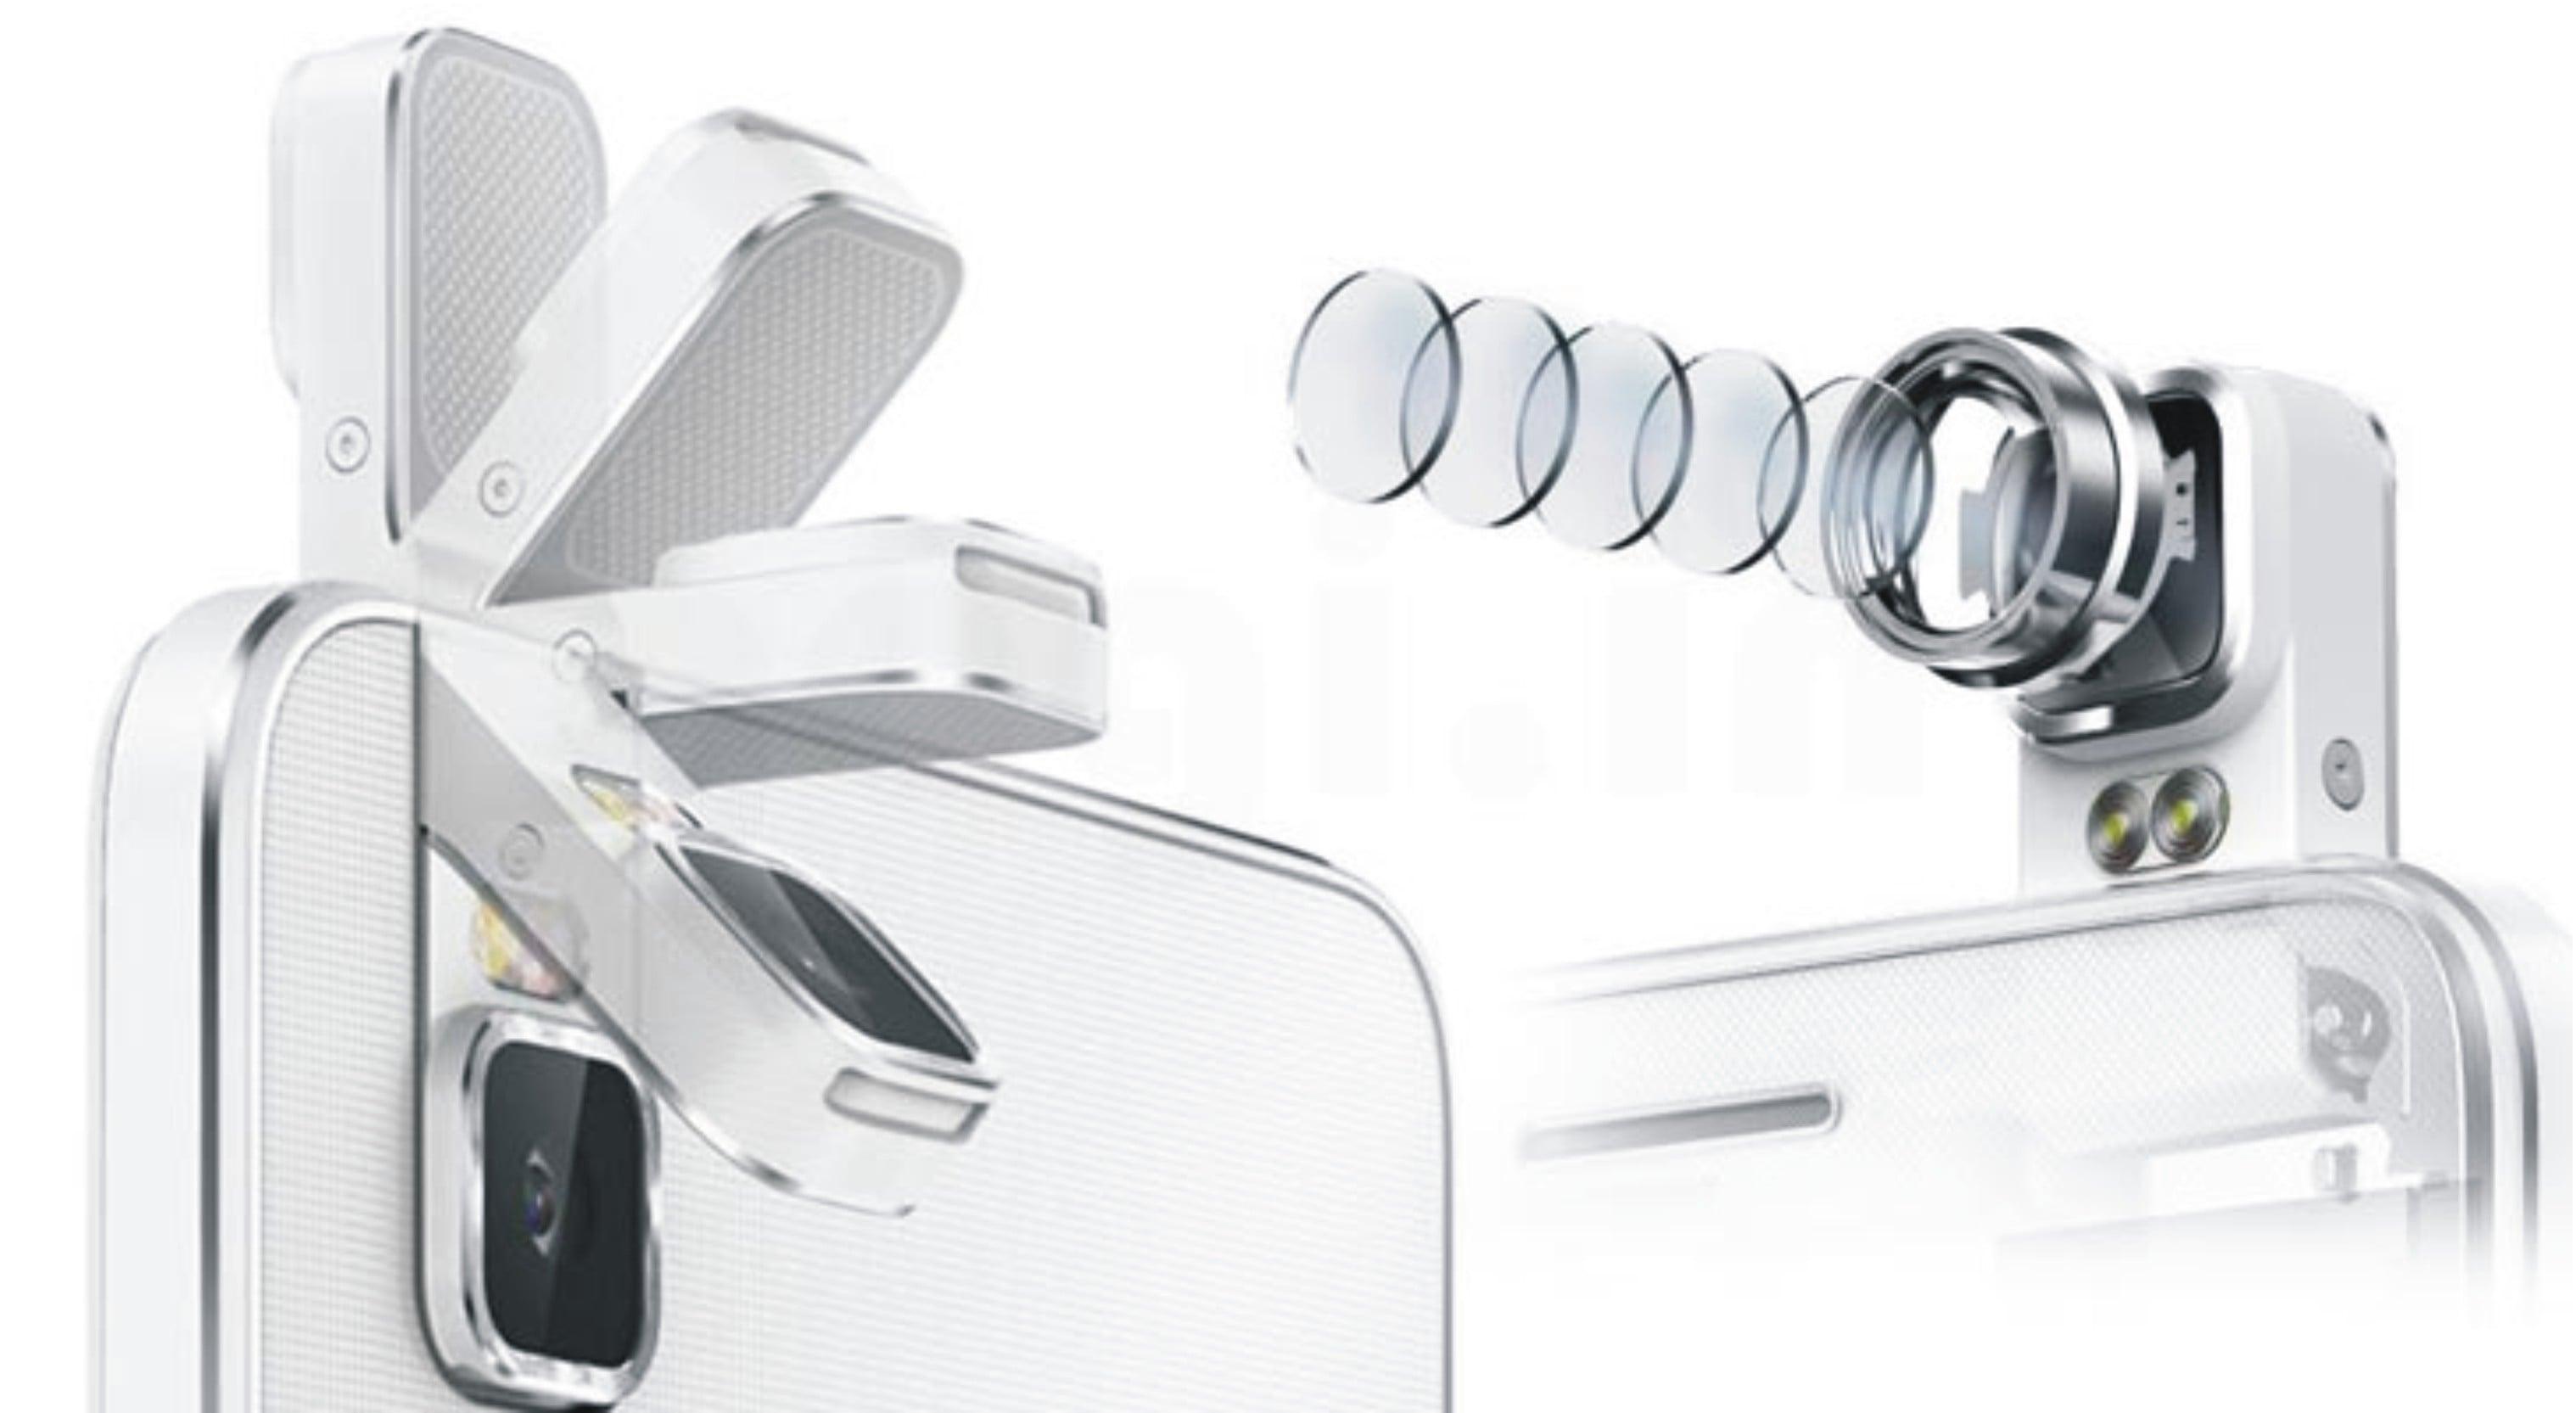 Magical Flip Camera of Huawei Shot X creating Buzz in the market